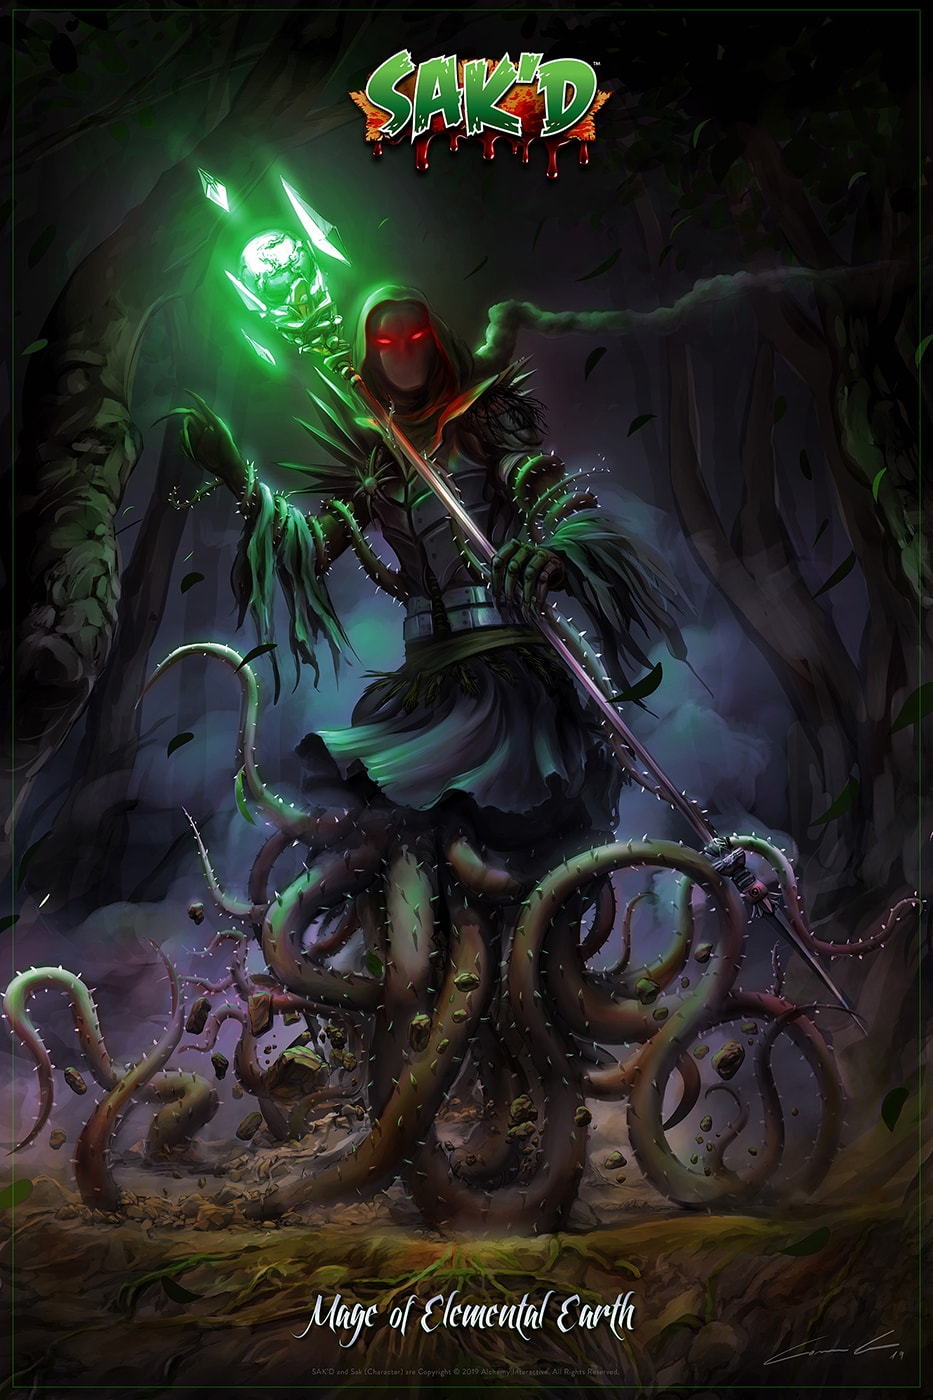 SAK'D - Dark Mage of Elemental Earth